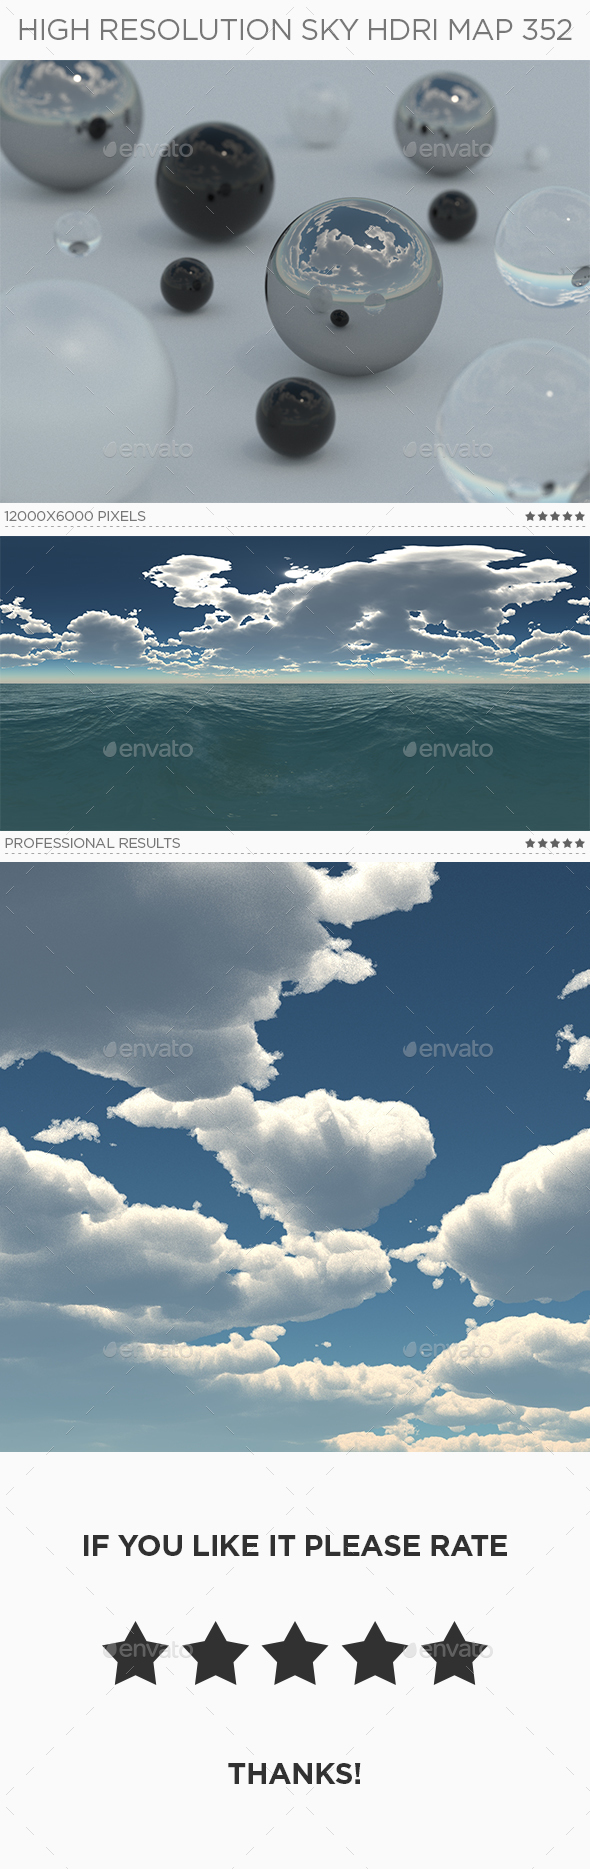 High Resolution Sky HDRi Map 352 - 3DOcean Item for Sale